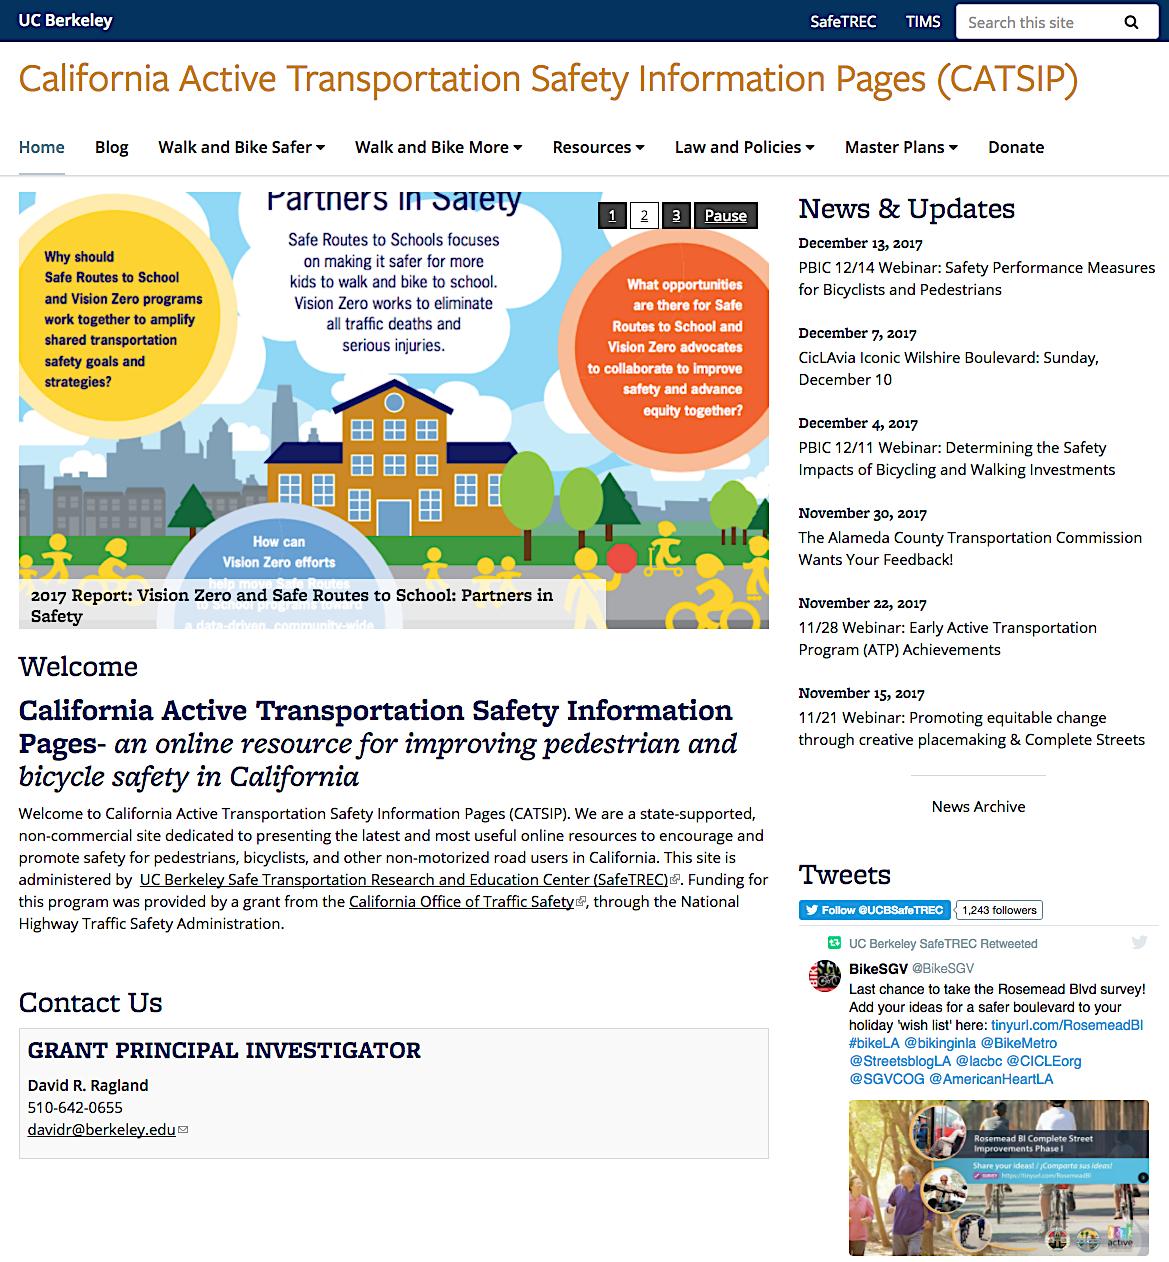 CATSIP Website